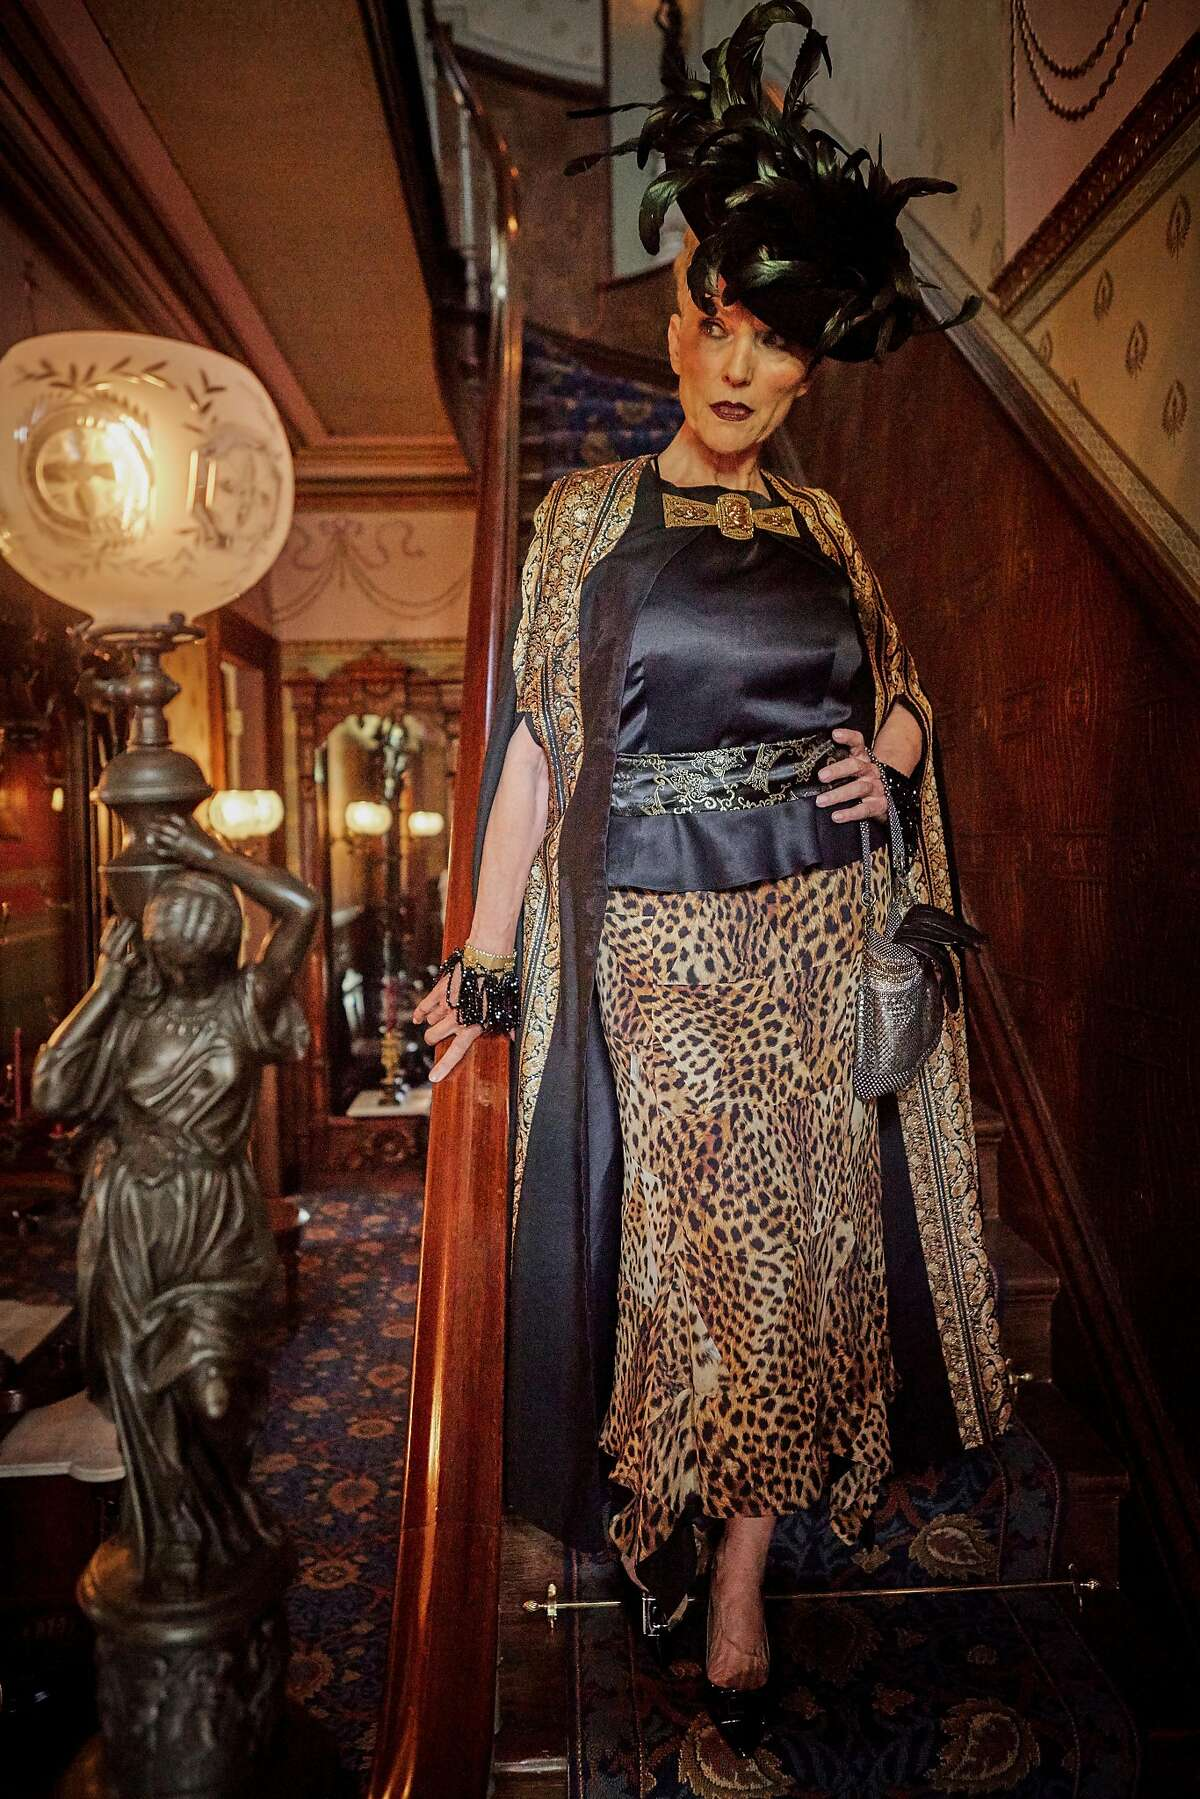 Maye wears a Juan Carlos leopard gown, $1,995, Barneys New York; Edwardian fabric cape, $595, gold fringe sash, $75, and Edwardian picture hat, $295, all Decades of Fashion; Laura B chain-mail purse, $1,345, Betty Lin, 3625 Sacramento St.; William de Lillo beaded bracelets, $6,500, MDVII Antiques; Ralph by Ralph Lauren patent pump, $98, Macy�s Union Square. Photography: Russell Yip ; Design Director: Elizabeth Burr; Style Editor: Laura Compton; Deputy Style Editor: Angela Salazar; Stylist: Tony Bravo; Makeup: Victor Cembellin / MAC Cosmetics; Hair: Dwight Davis / davissaizsalon.com; Models: Maye Musk / Look Model Agency, SF; Audrey B. / Look Model Agency, SF; Stylist Asst: Rachel Znerold; Photo Assistants.: Stan Pechner, Cameron Robert, Danielle Mitchell; Hair Assistant: Norma Avalos